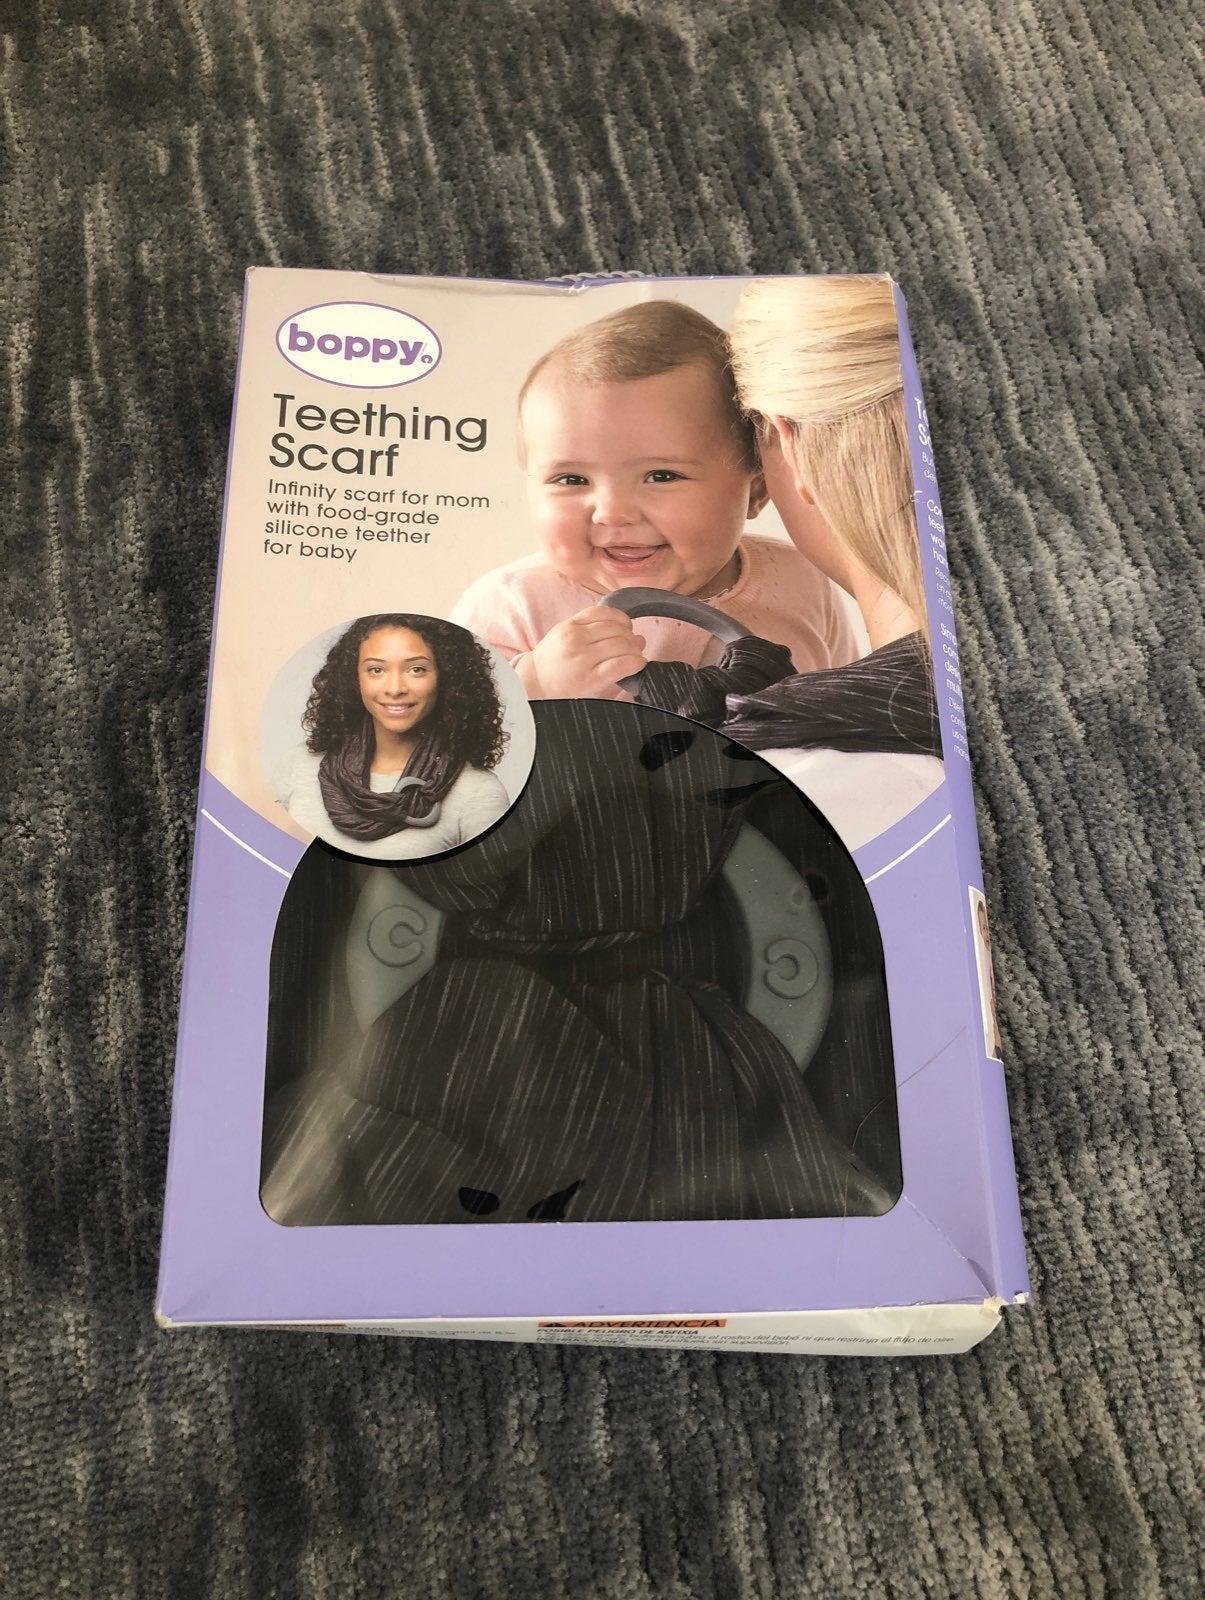 Boppy Teething Scarf